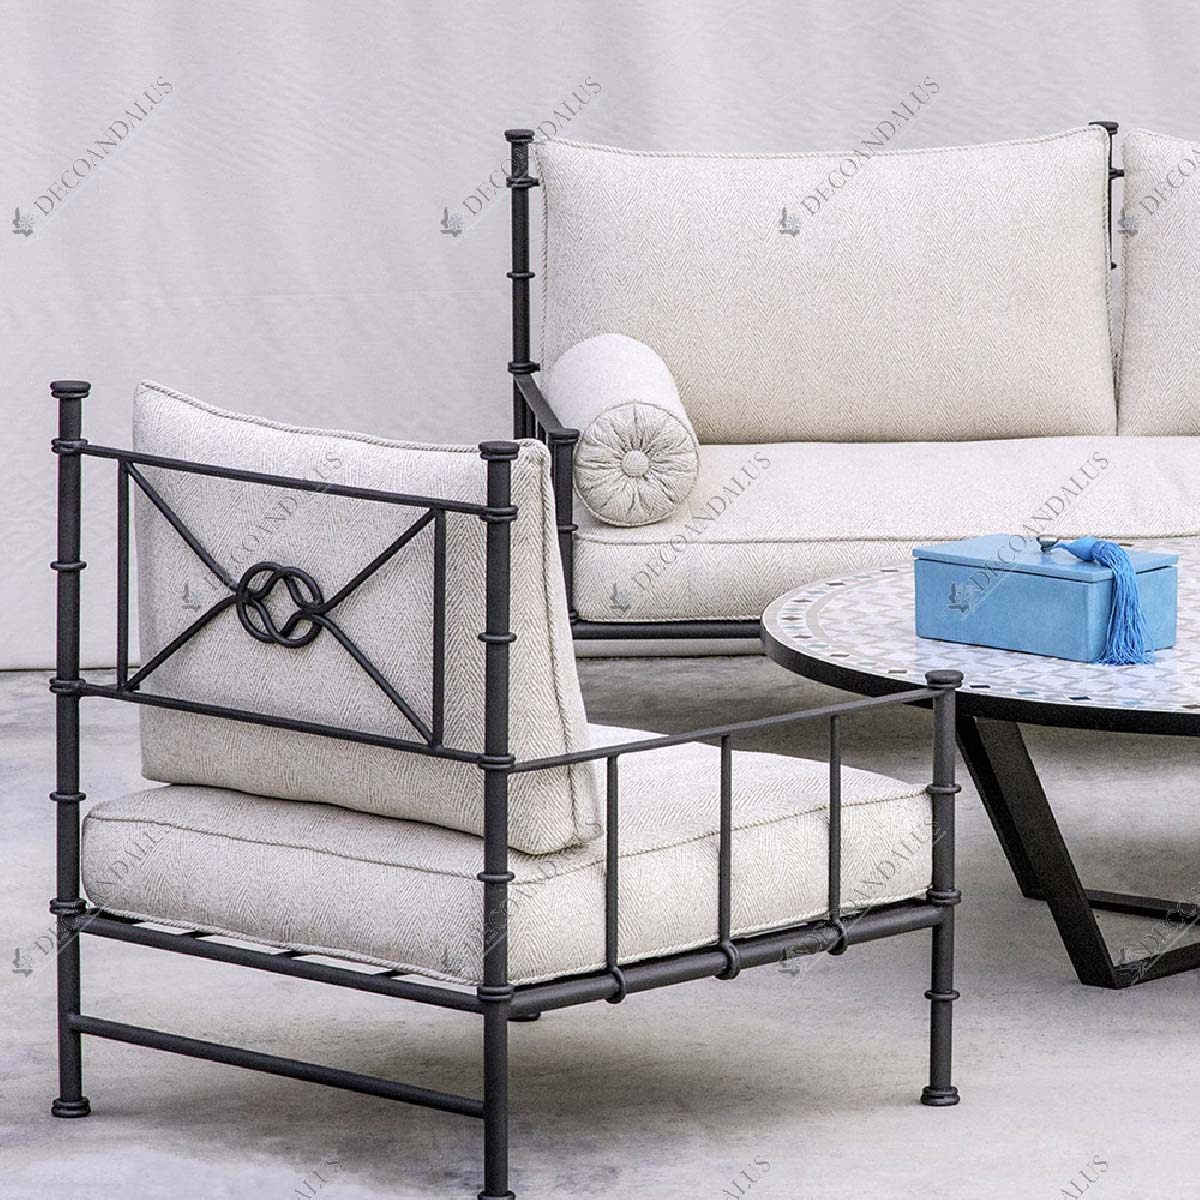 Sof exterior de estilo rabe andalus fabricaci n a for Sofa exterior marbella